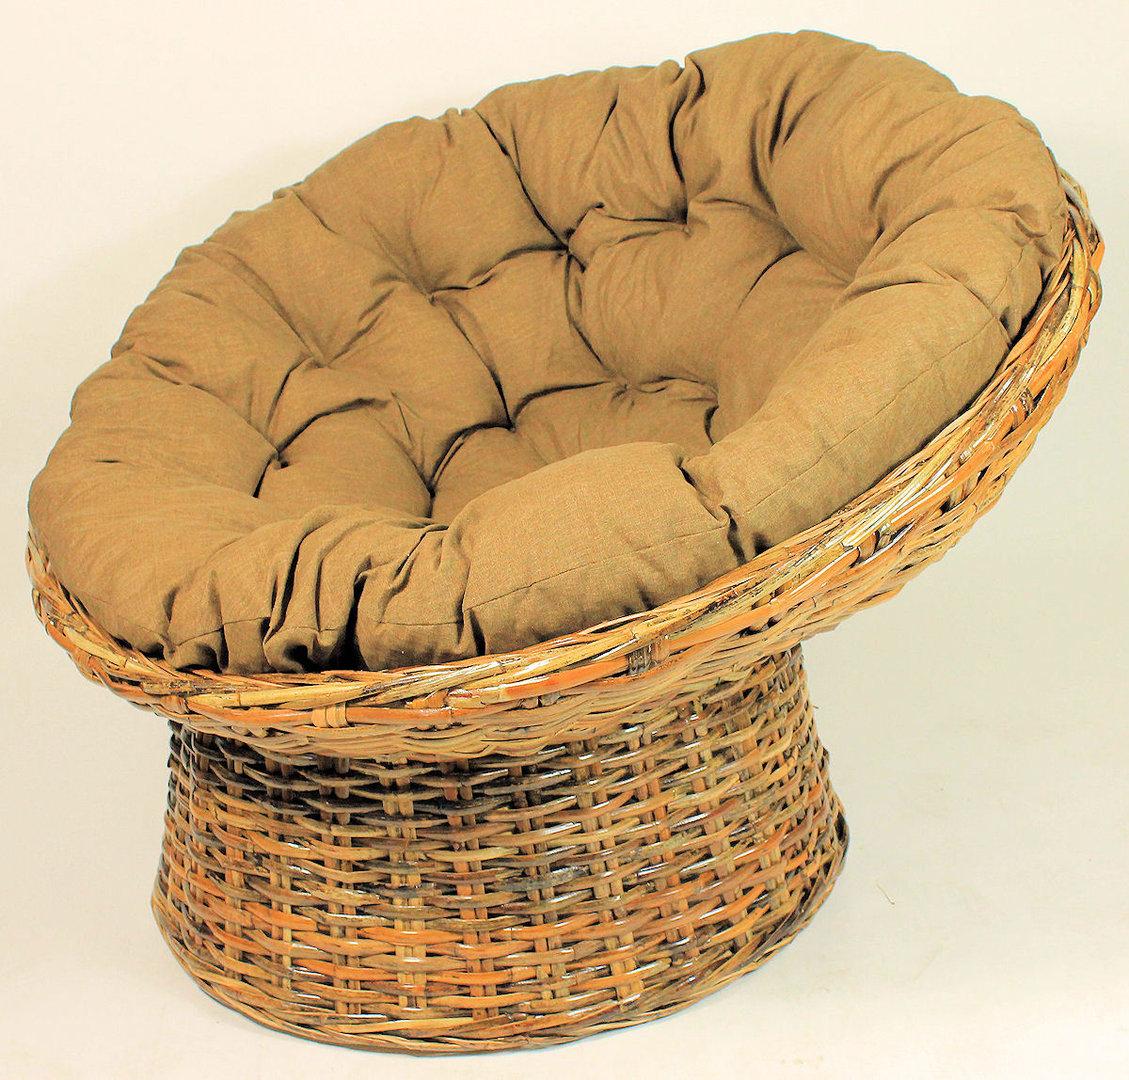 xxl rattansessel papasansessel abacca rattan xxl. Black Bedroom Furniture Sets. Home Design Ideas